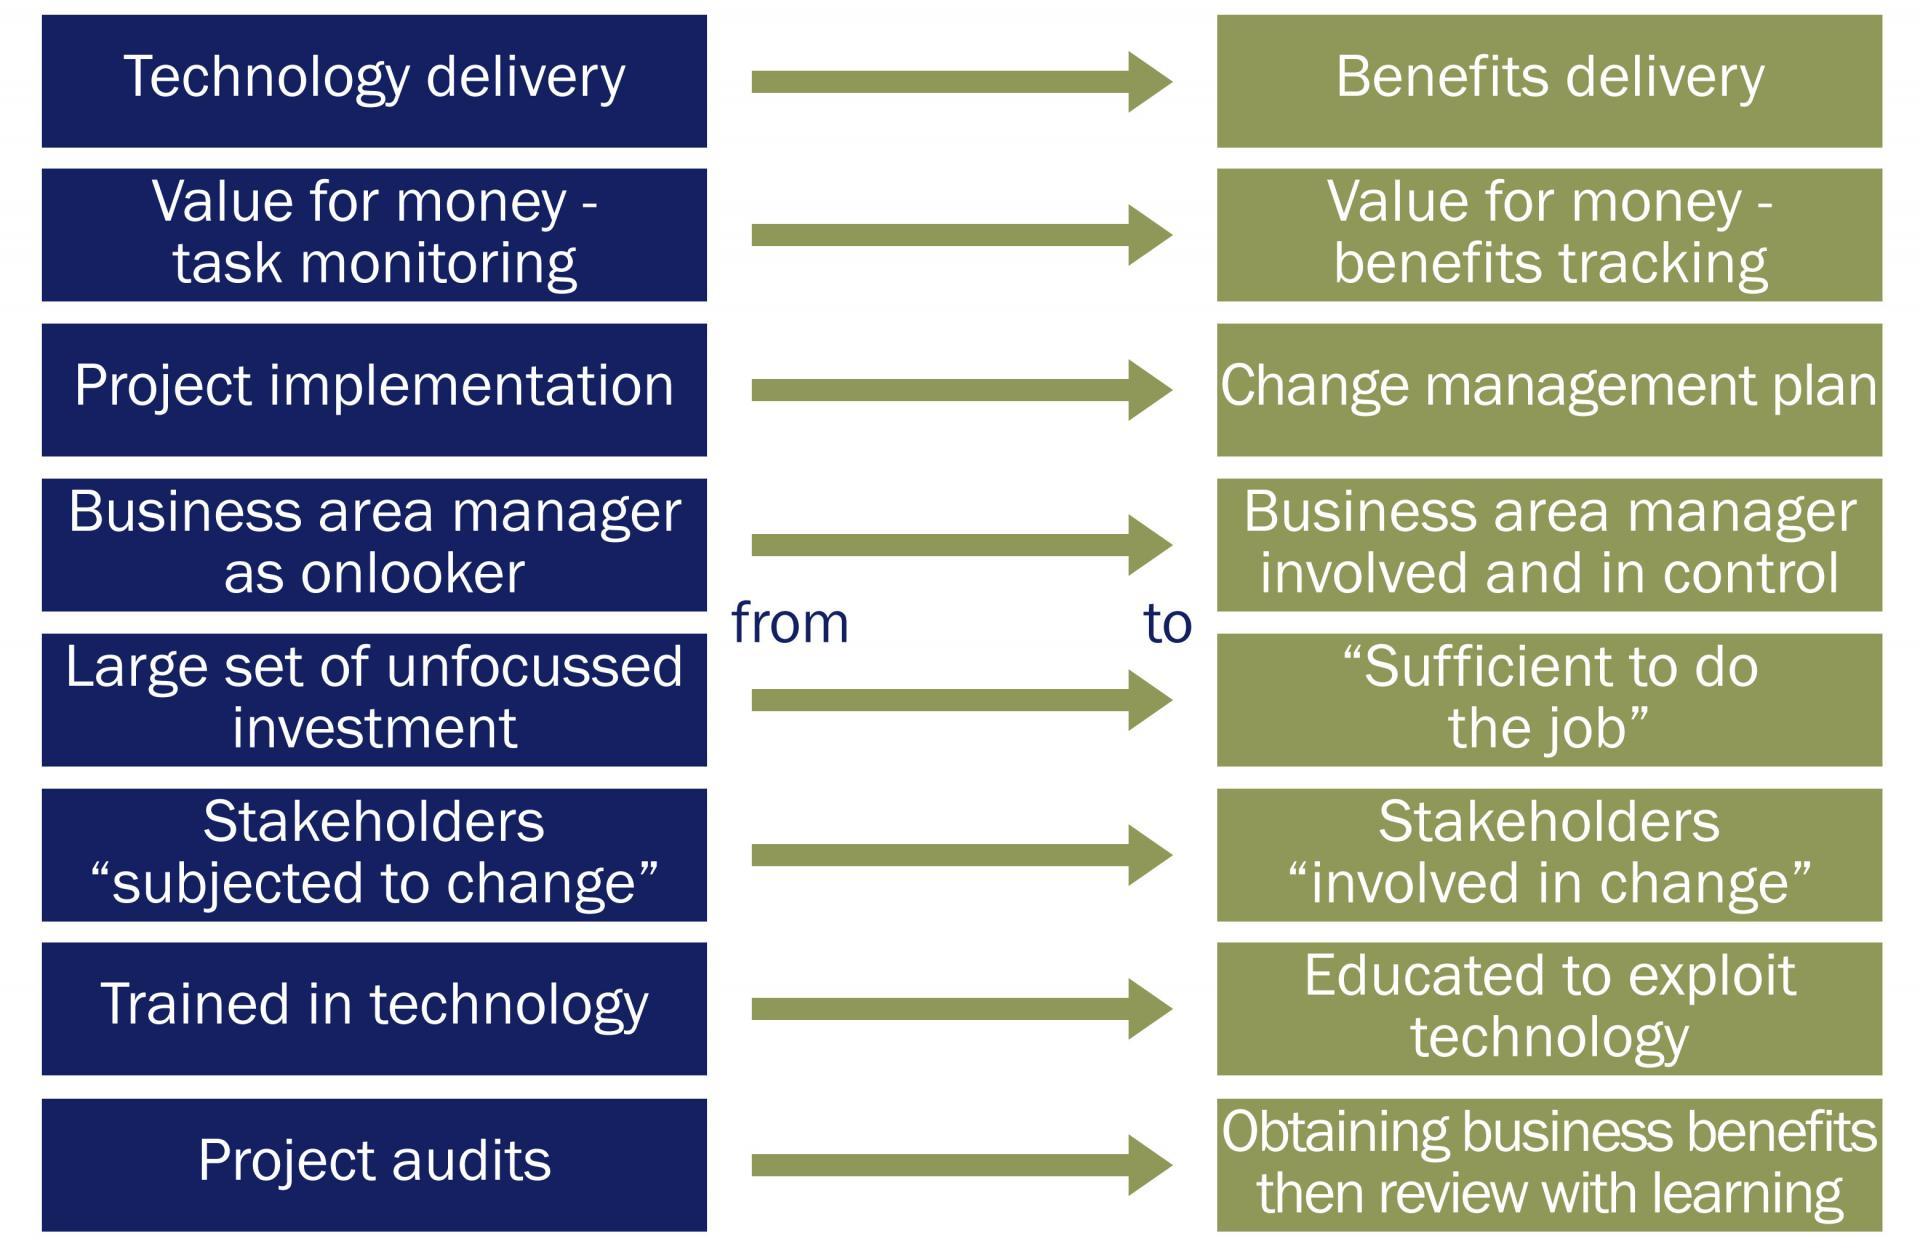 Prince2 benefits realisation plan template image for Benefits realization plan template